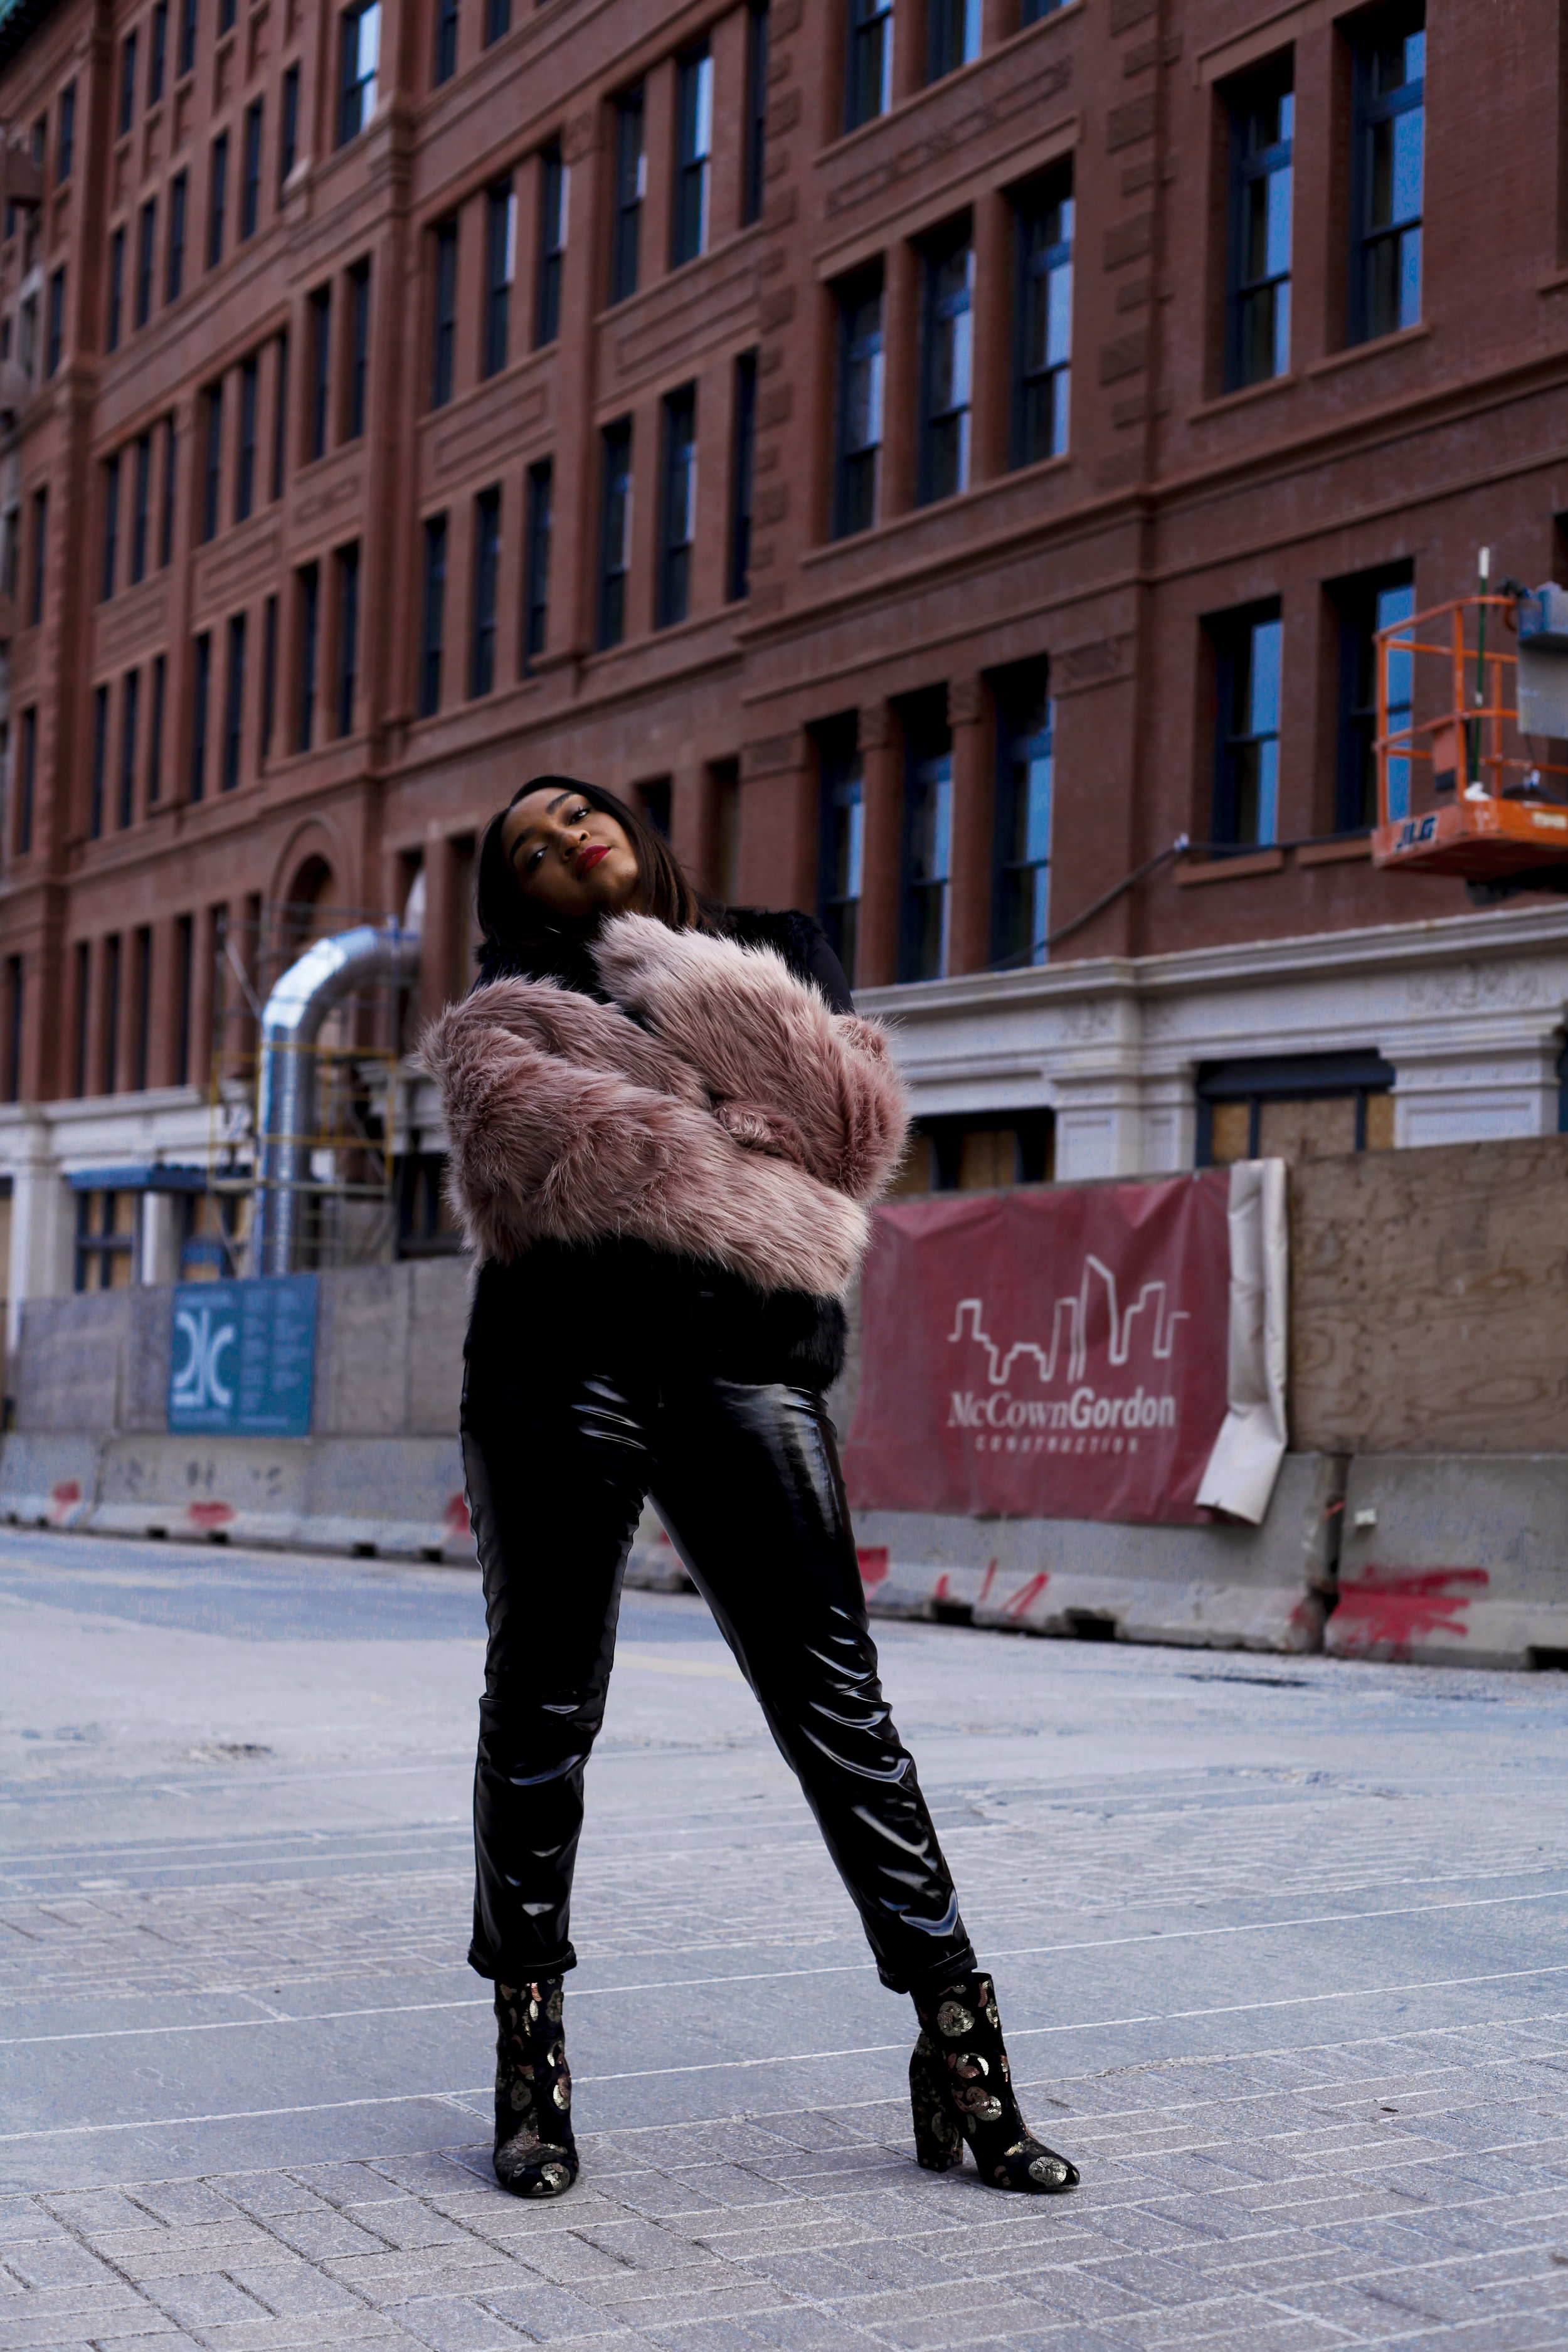 top kansas city fashion blogger, jasmine diane, wearing leather pants and purple coat.